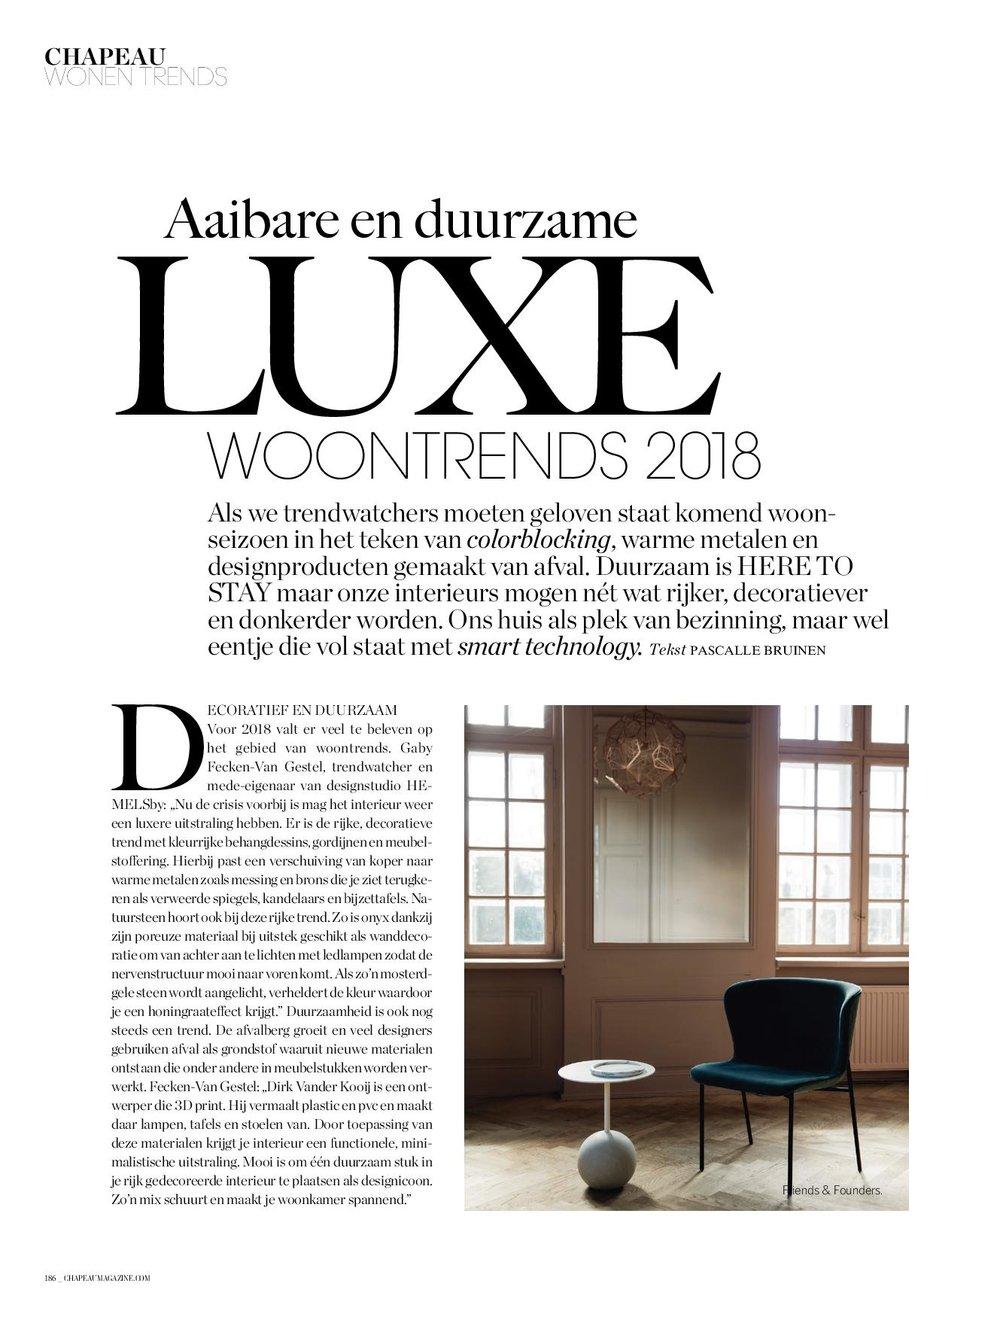 ChapeauMagazineNr5 2017 186-page-001 (1).jpg